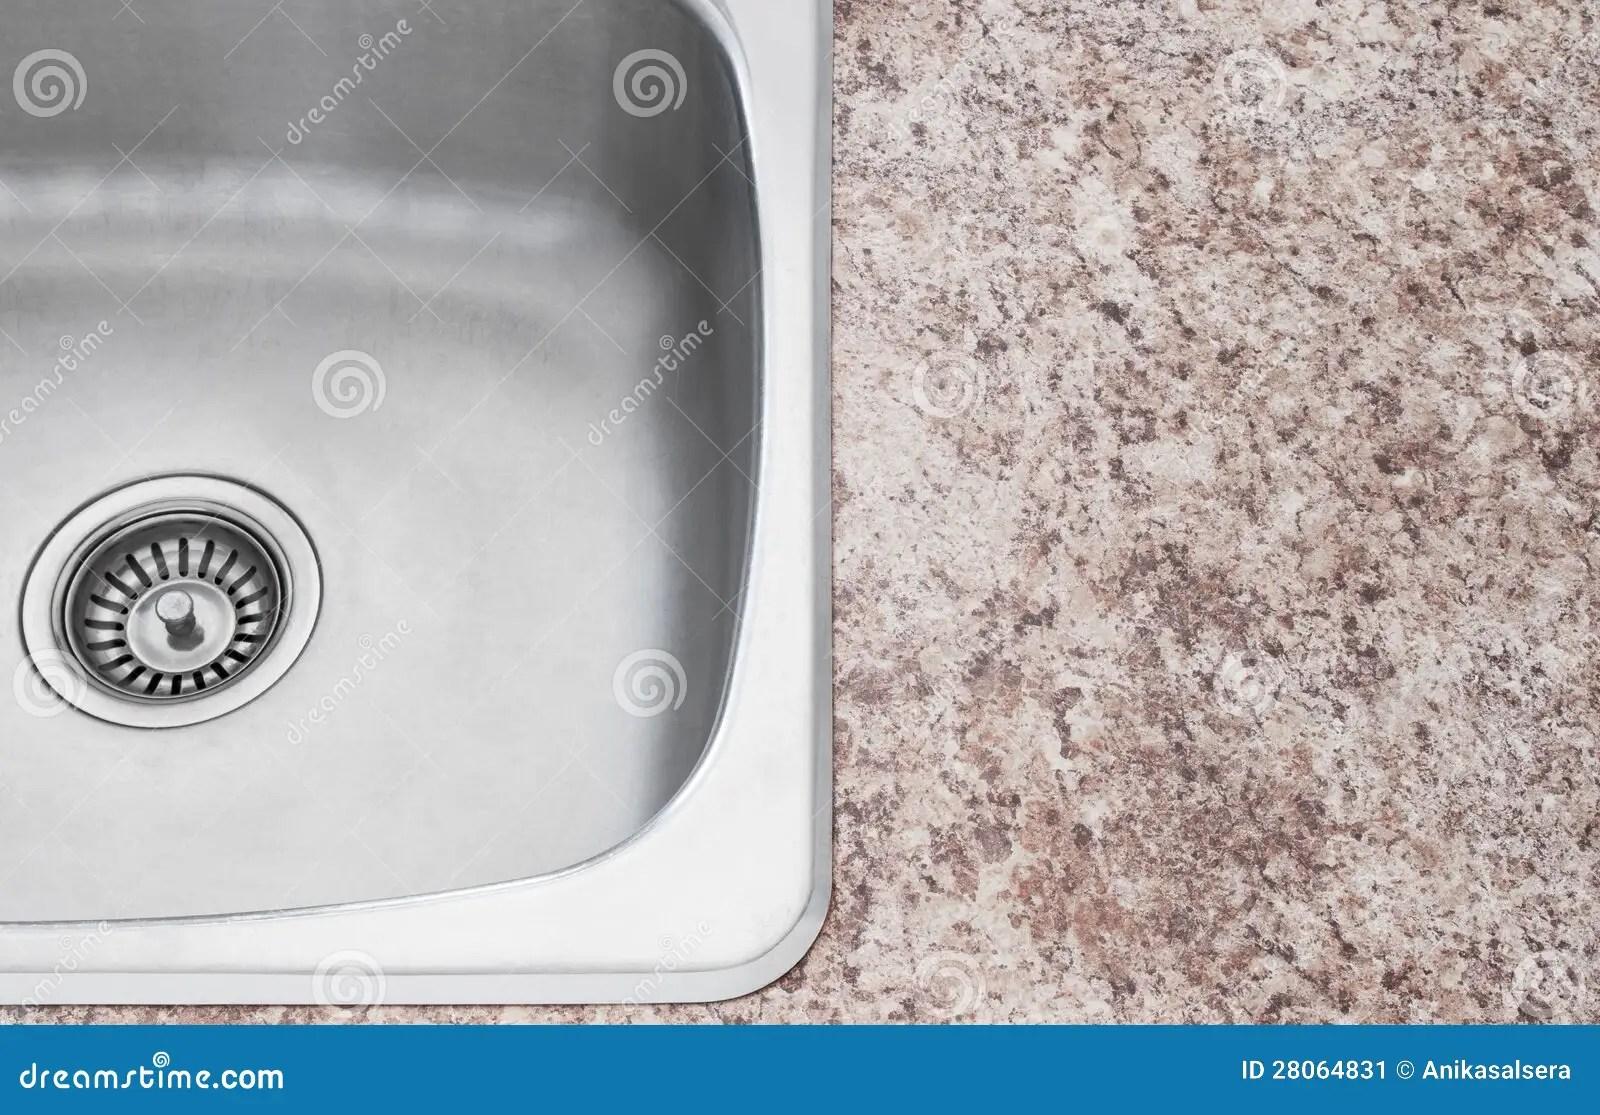 new kitchen sink kohler porcelain 新的厨房水槽和工作台面详细资料库存图片 图片包括有背包 计数器 新的厨房水槽和工作台面详细资料